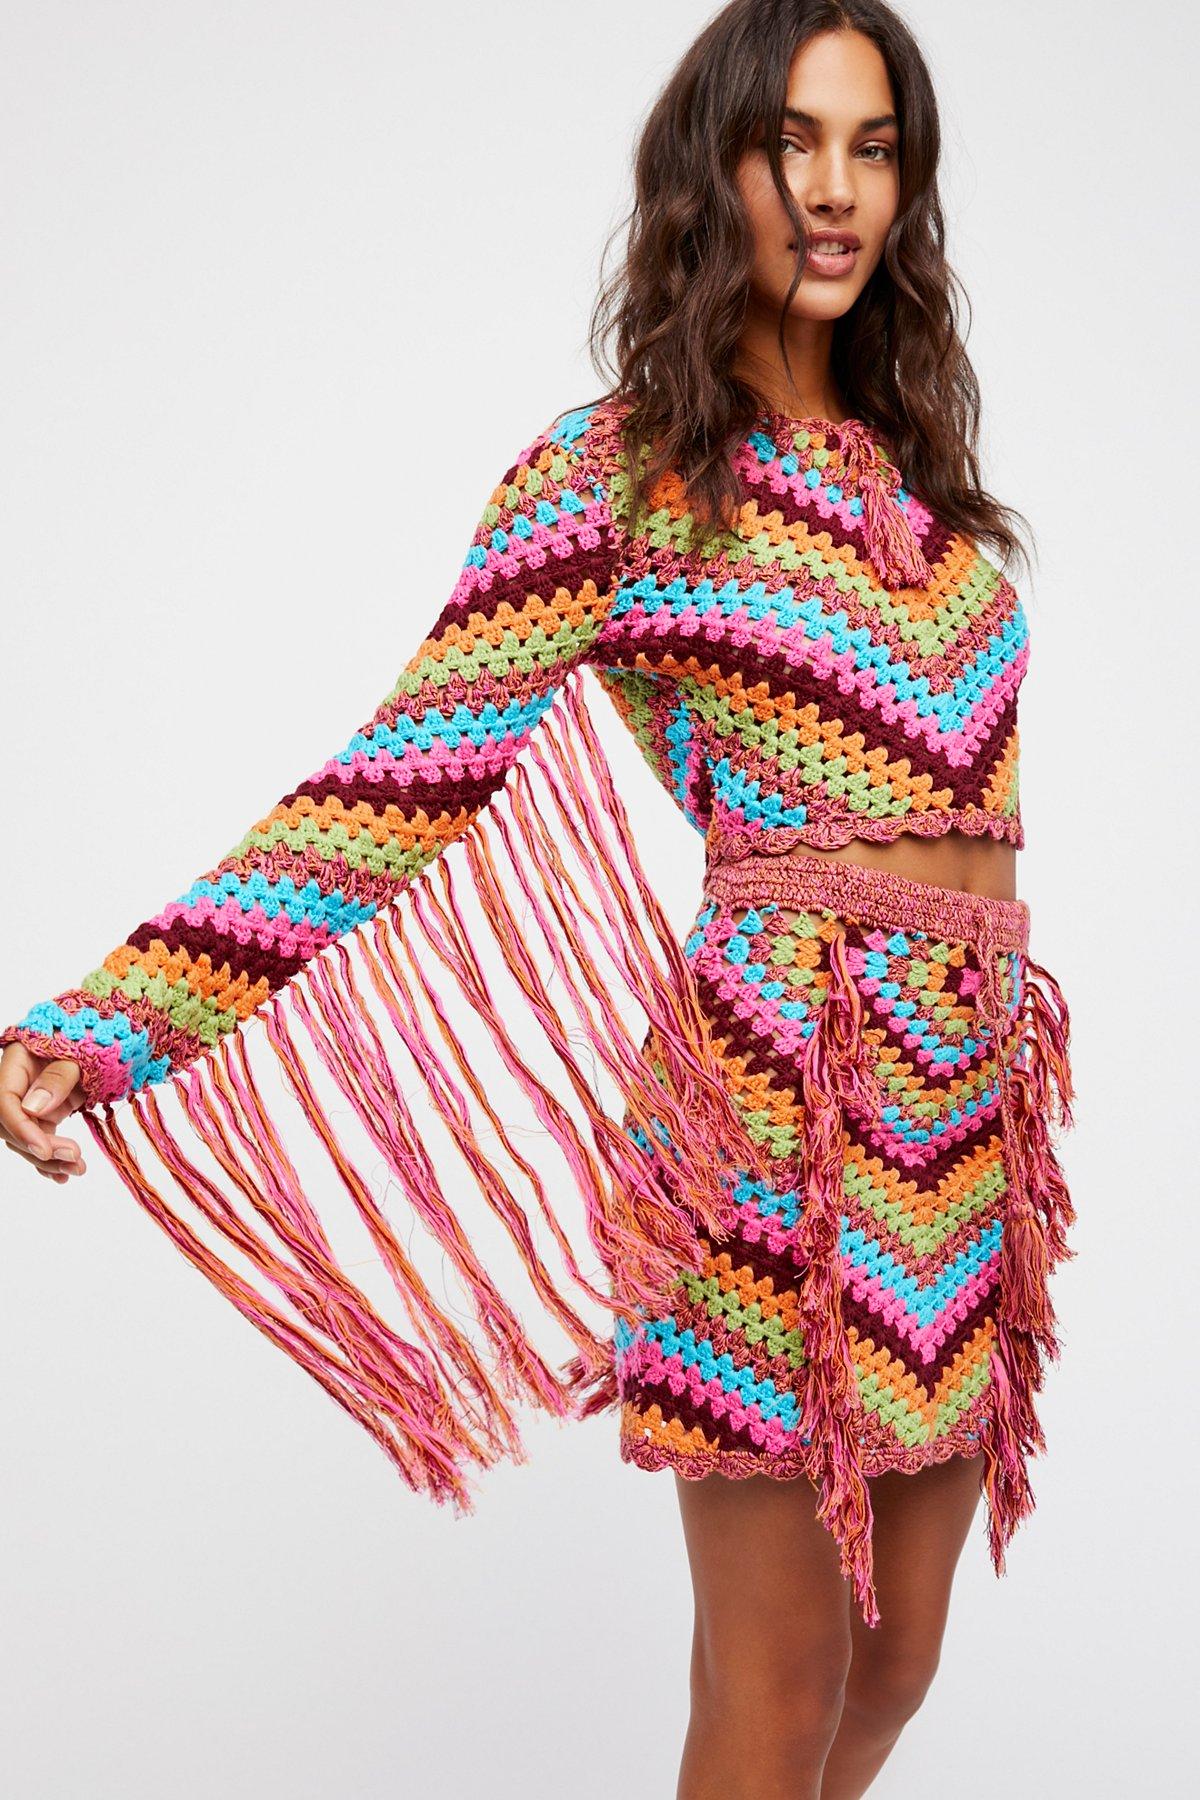 Joni Crochet Set